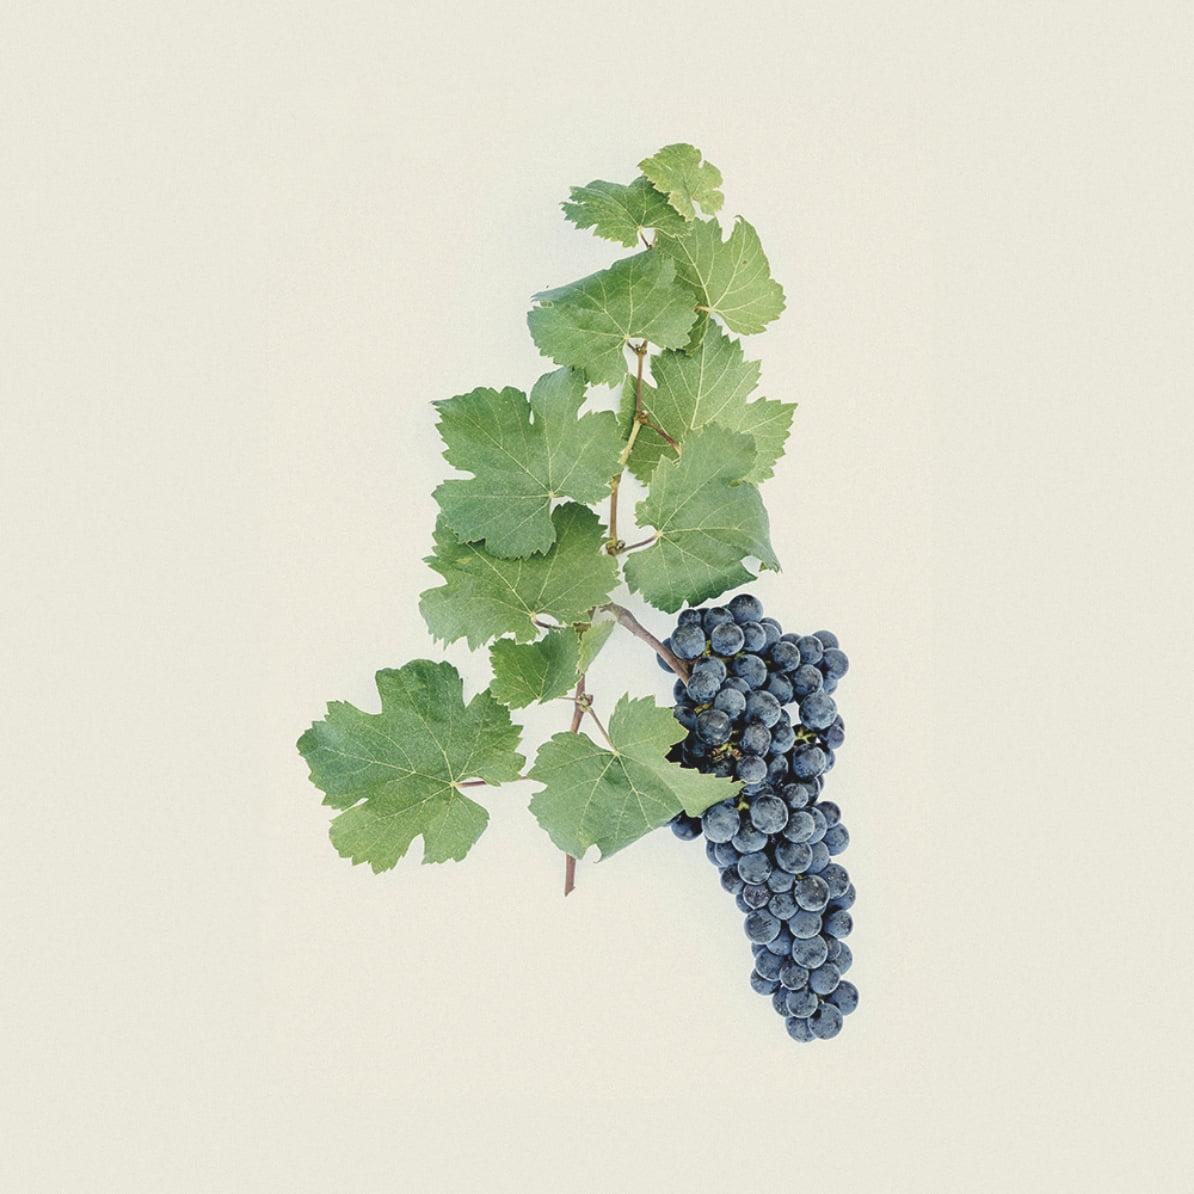 Wine région Médoc château grape variety Merlot